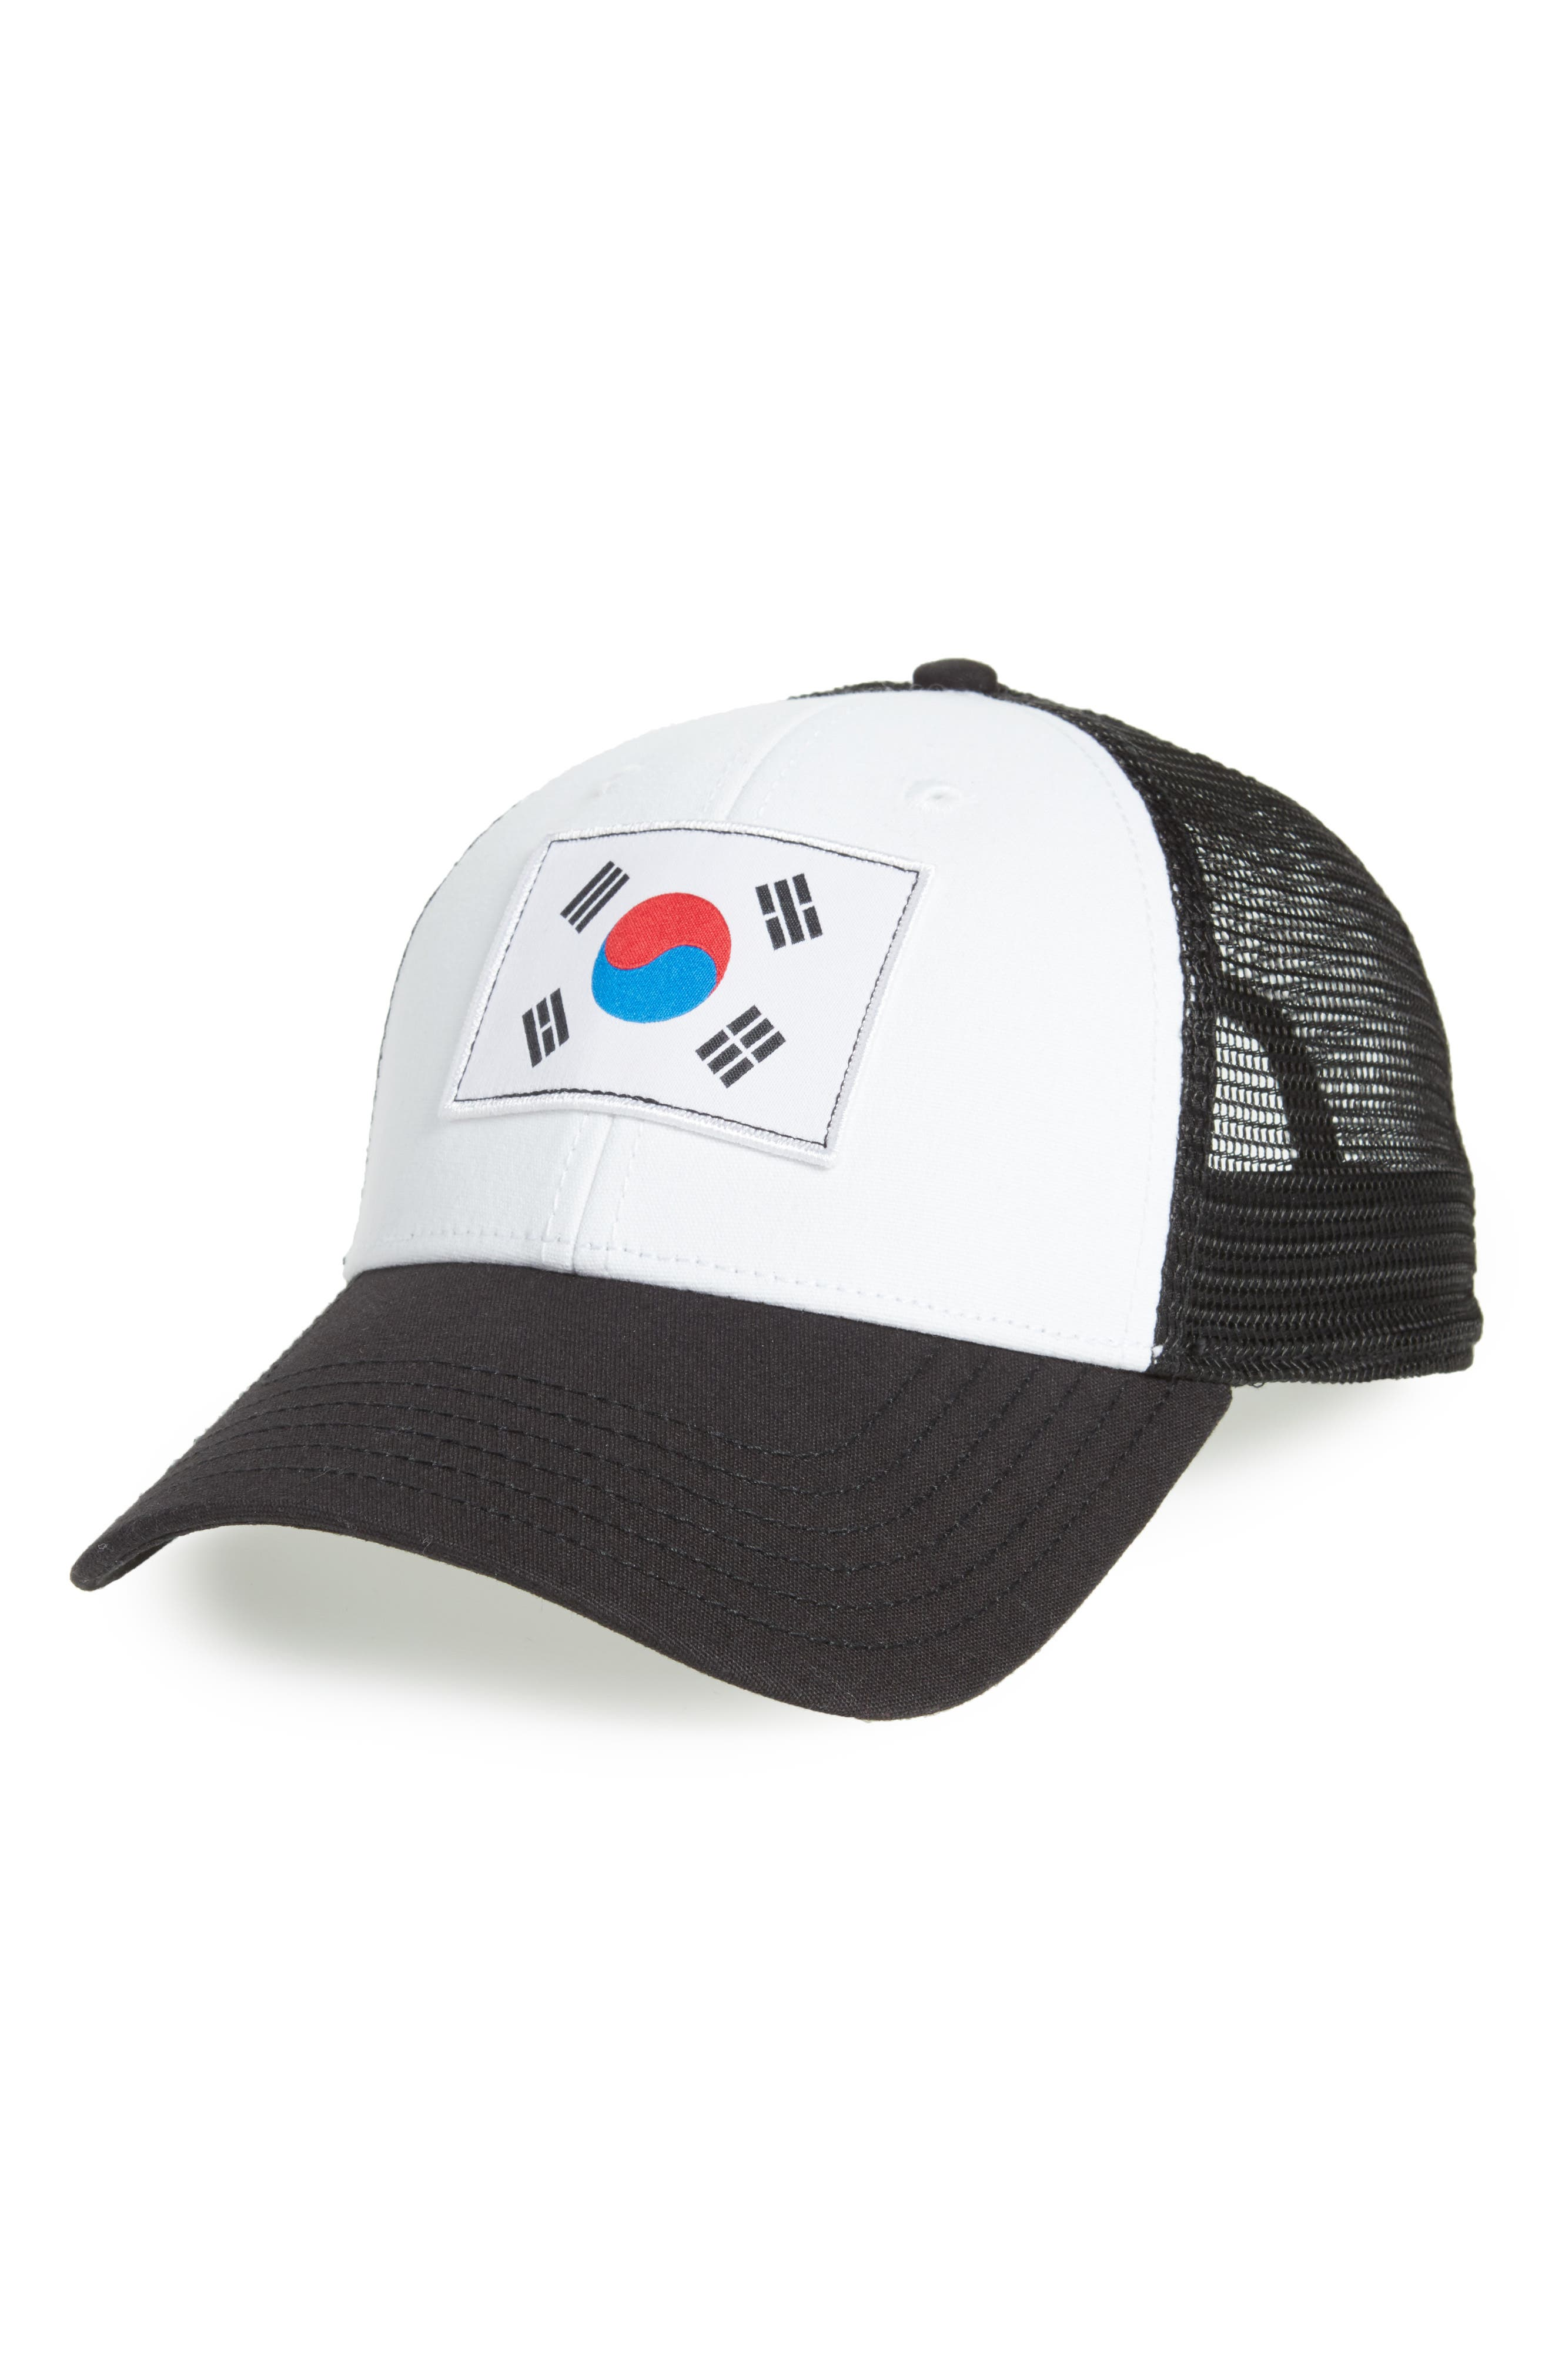 International Collection Baseball Cap,                         Main,                         color, 100